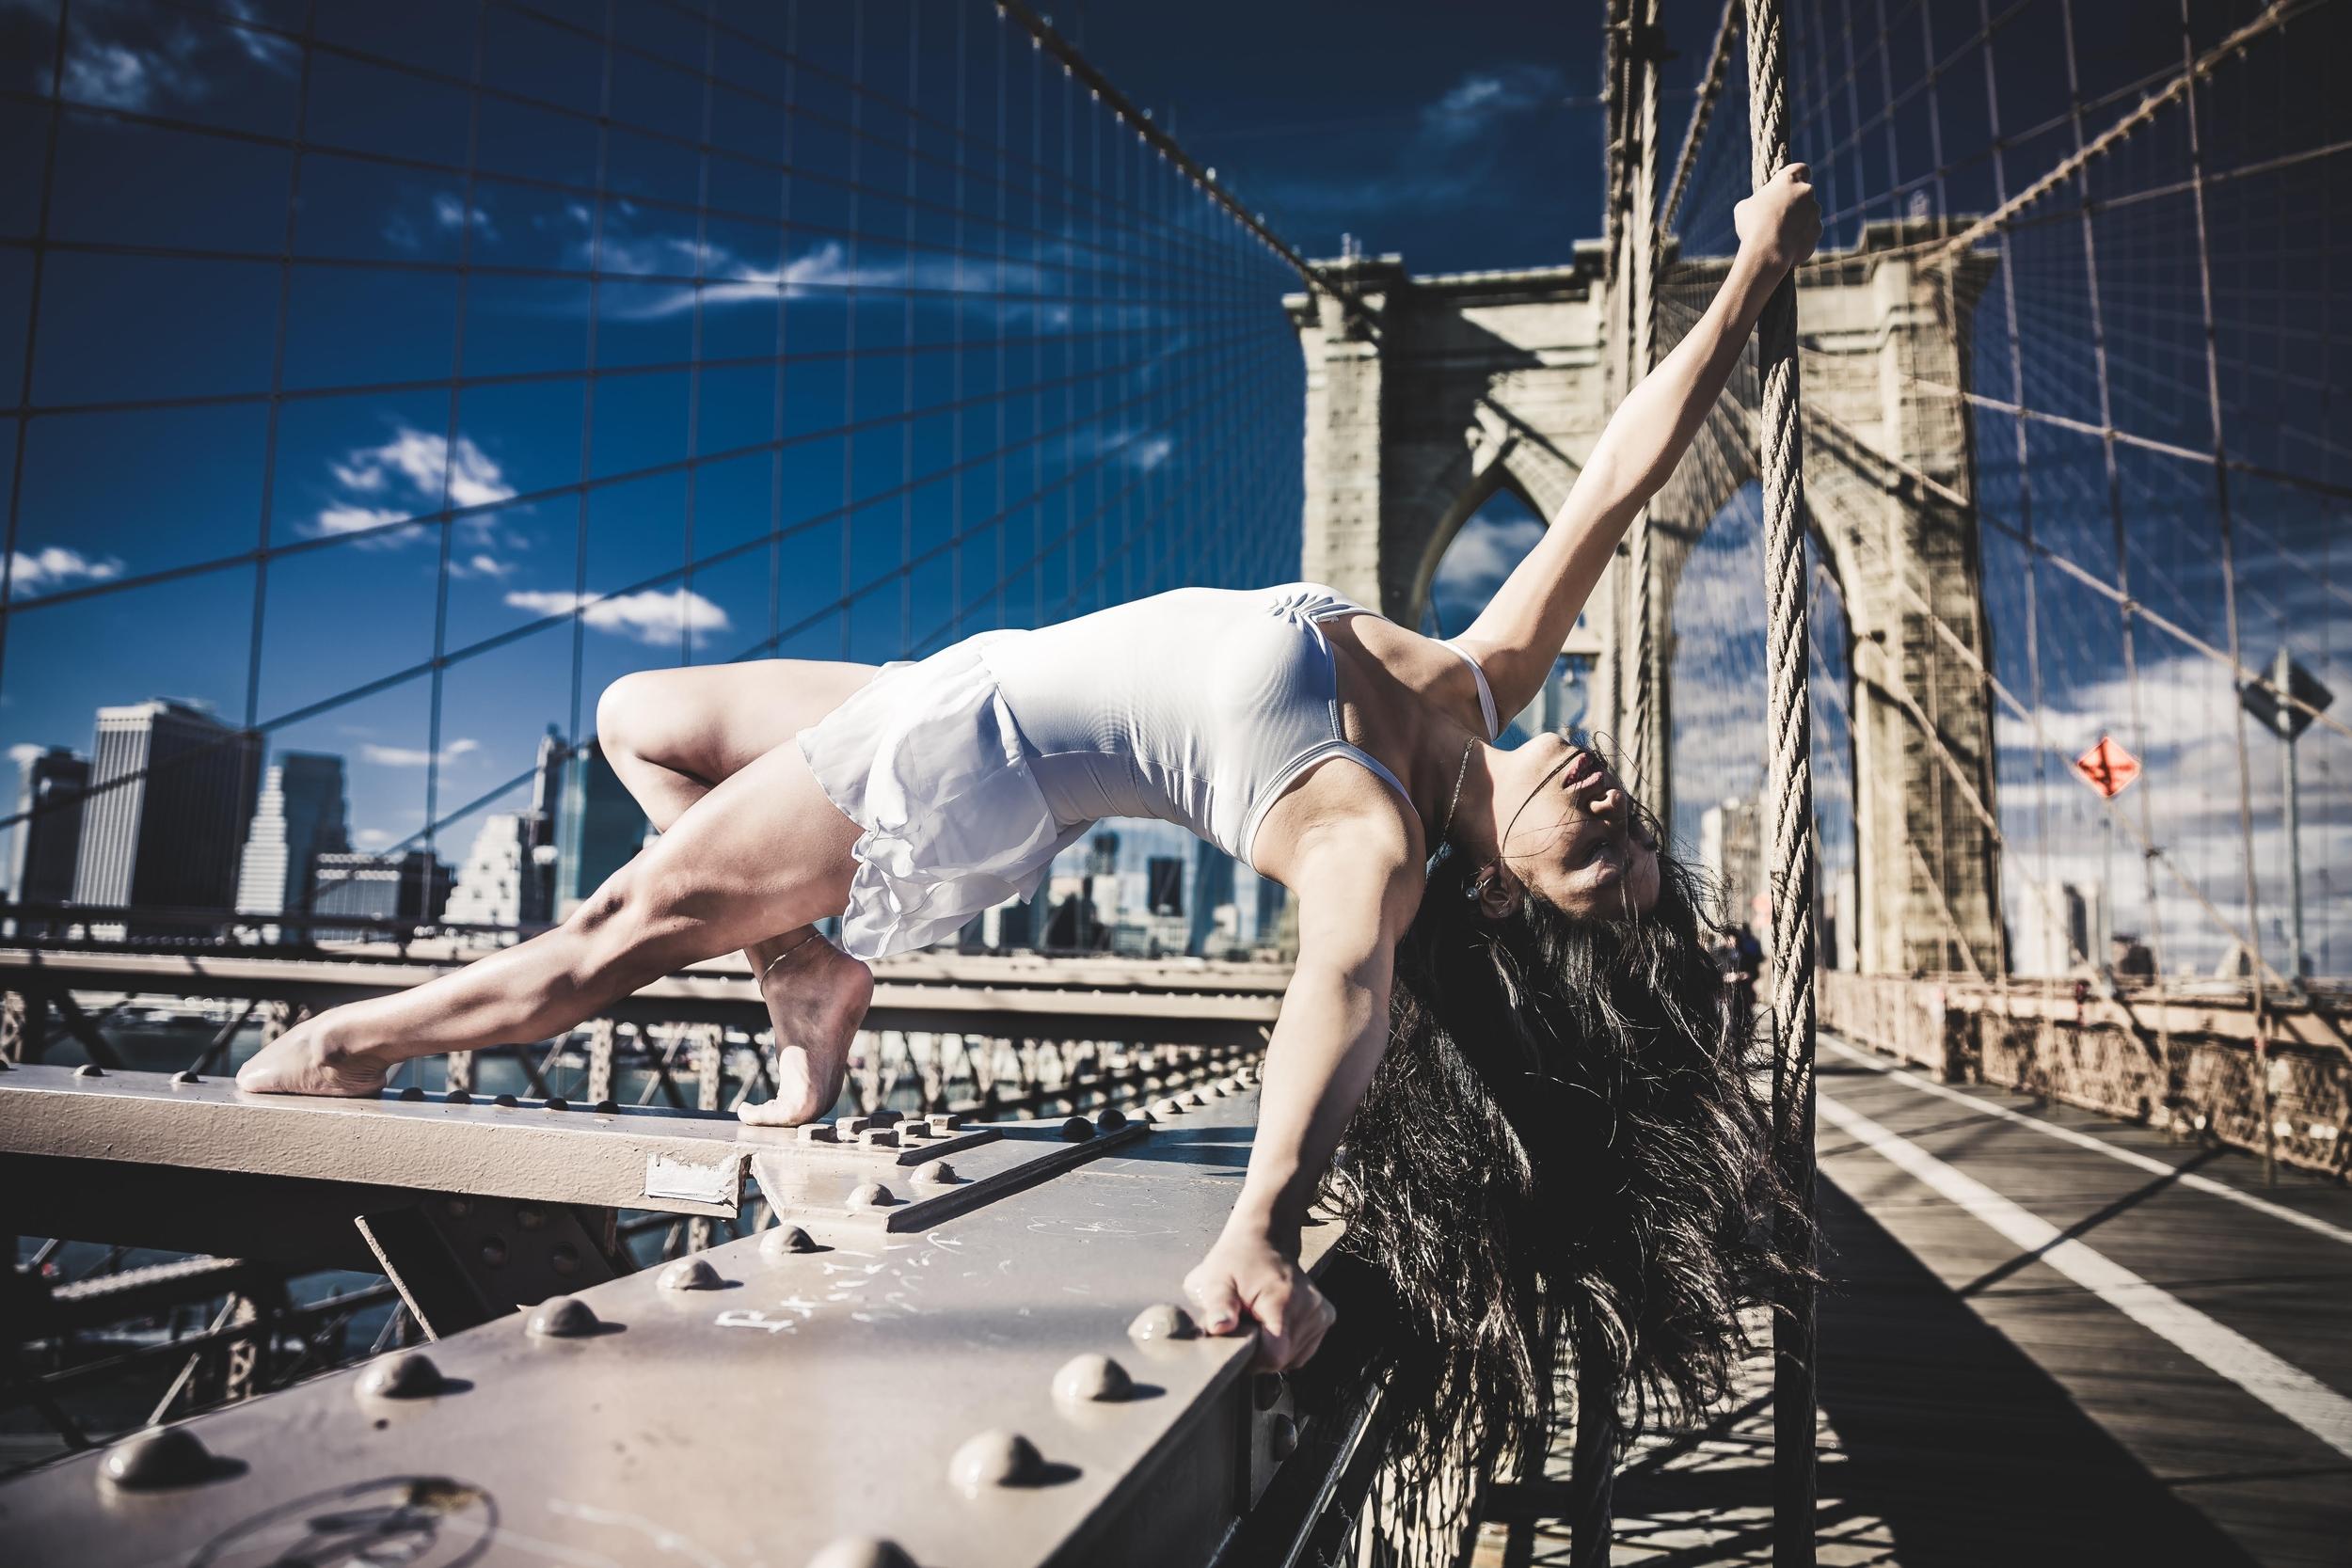 Jessica Janette Silva Dancer NYC New York Top Best Amazing Dancers Brooklyn.jpg